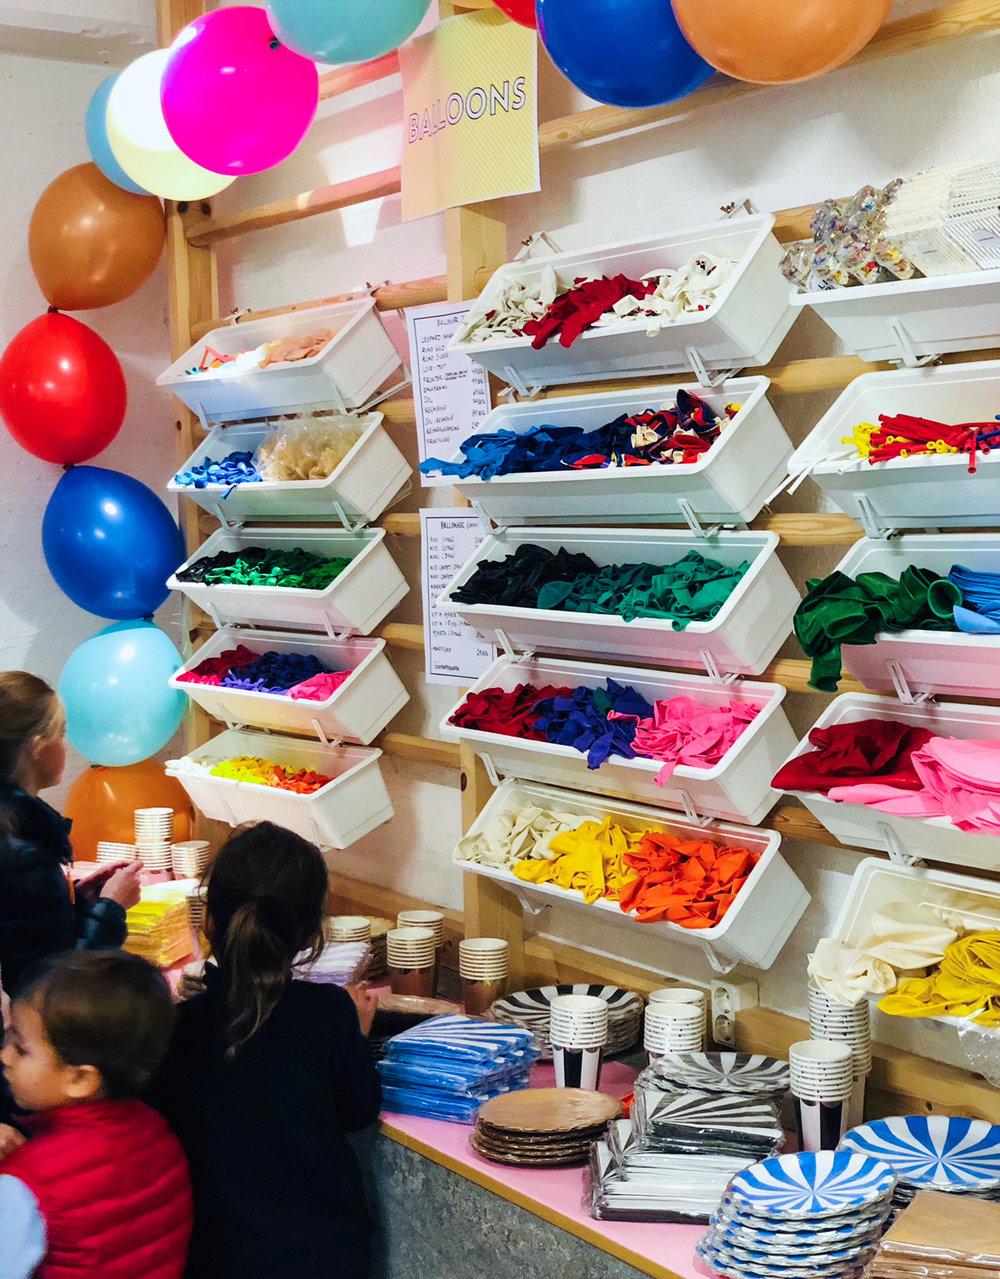 Confettiquette showroom